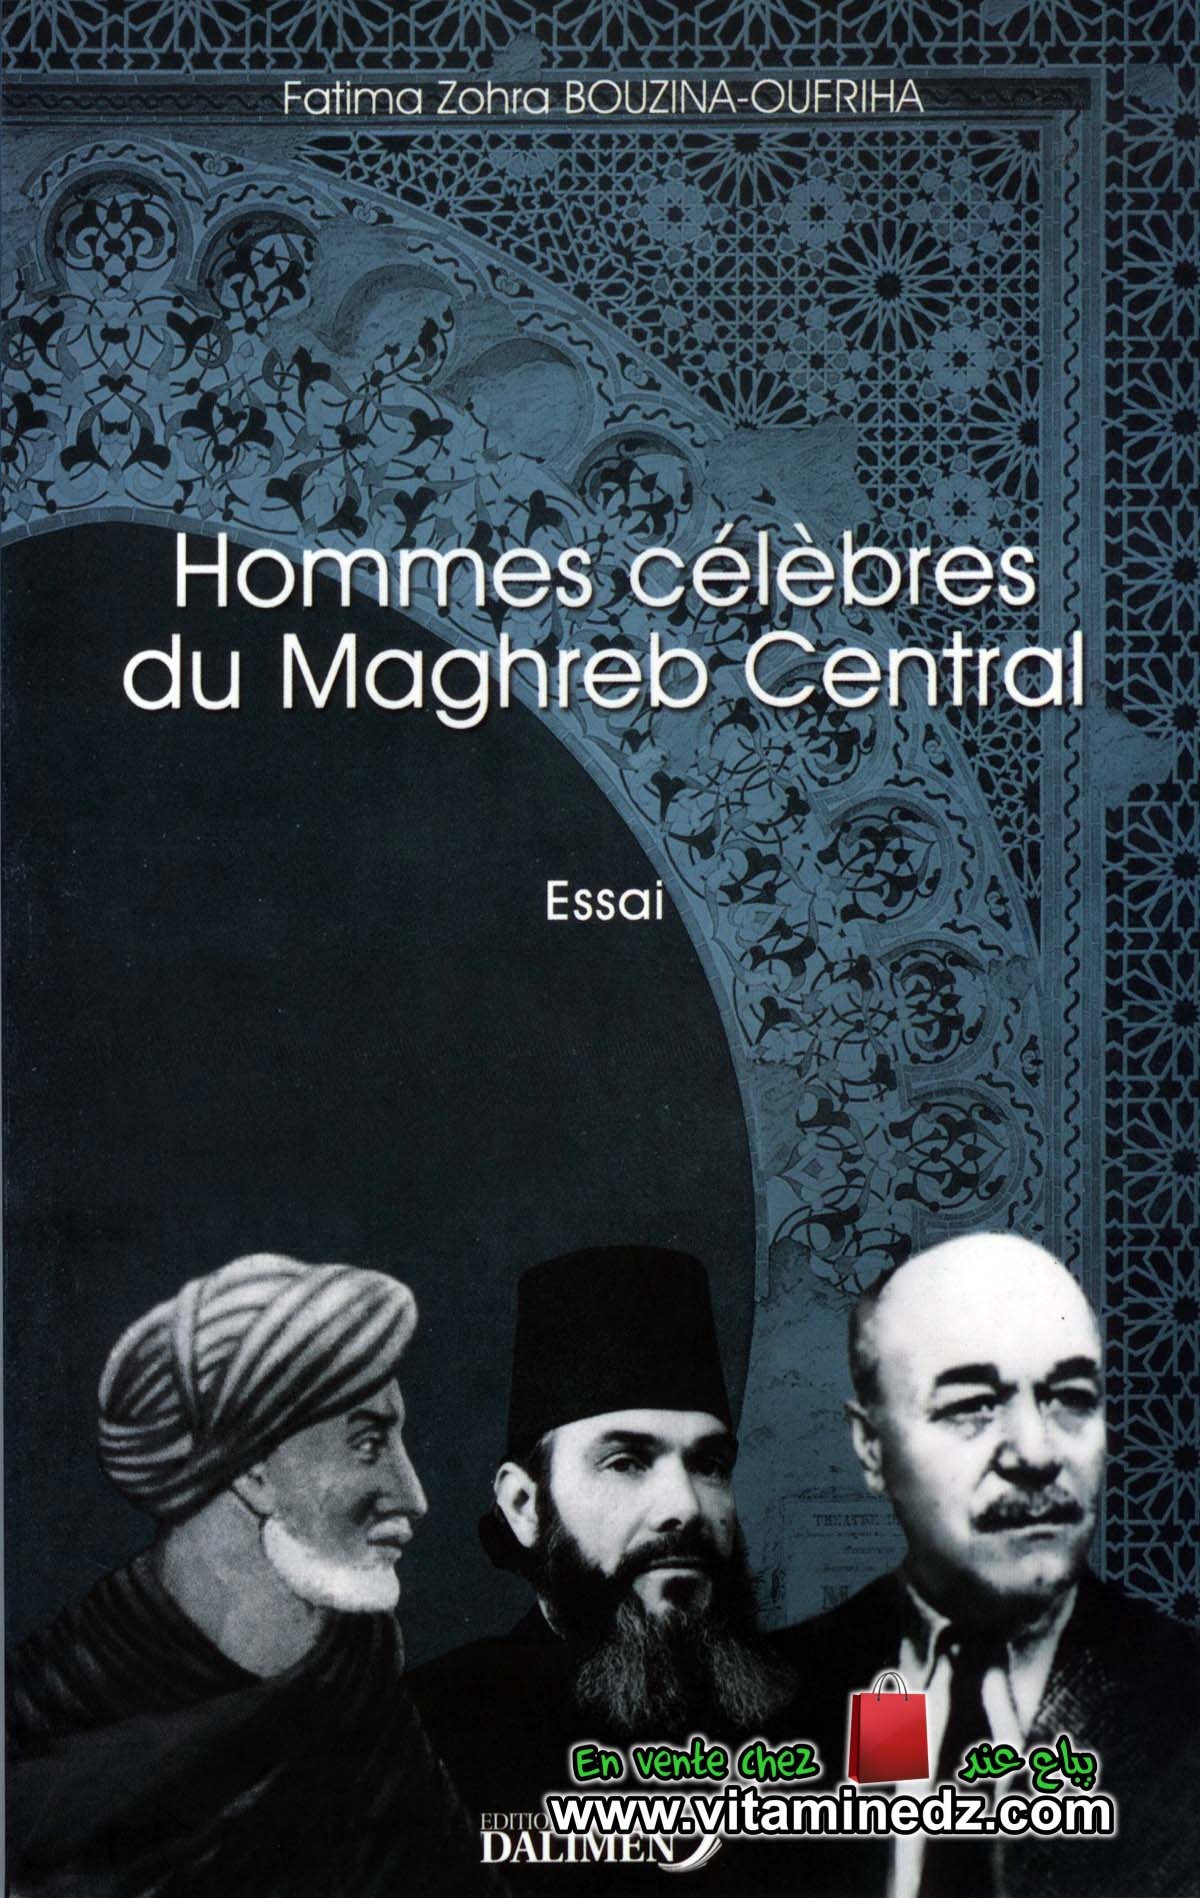 Fatima Zohra Bouzina-Oufriha - Hommes célèbres du Maghreb Central